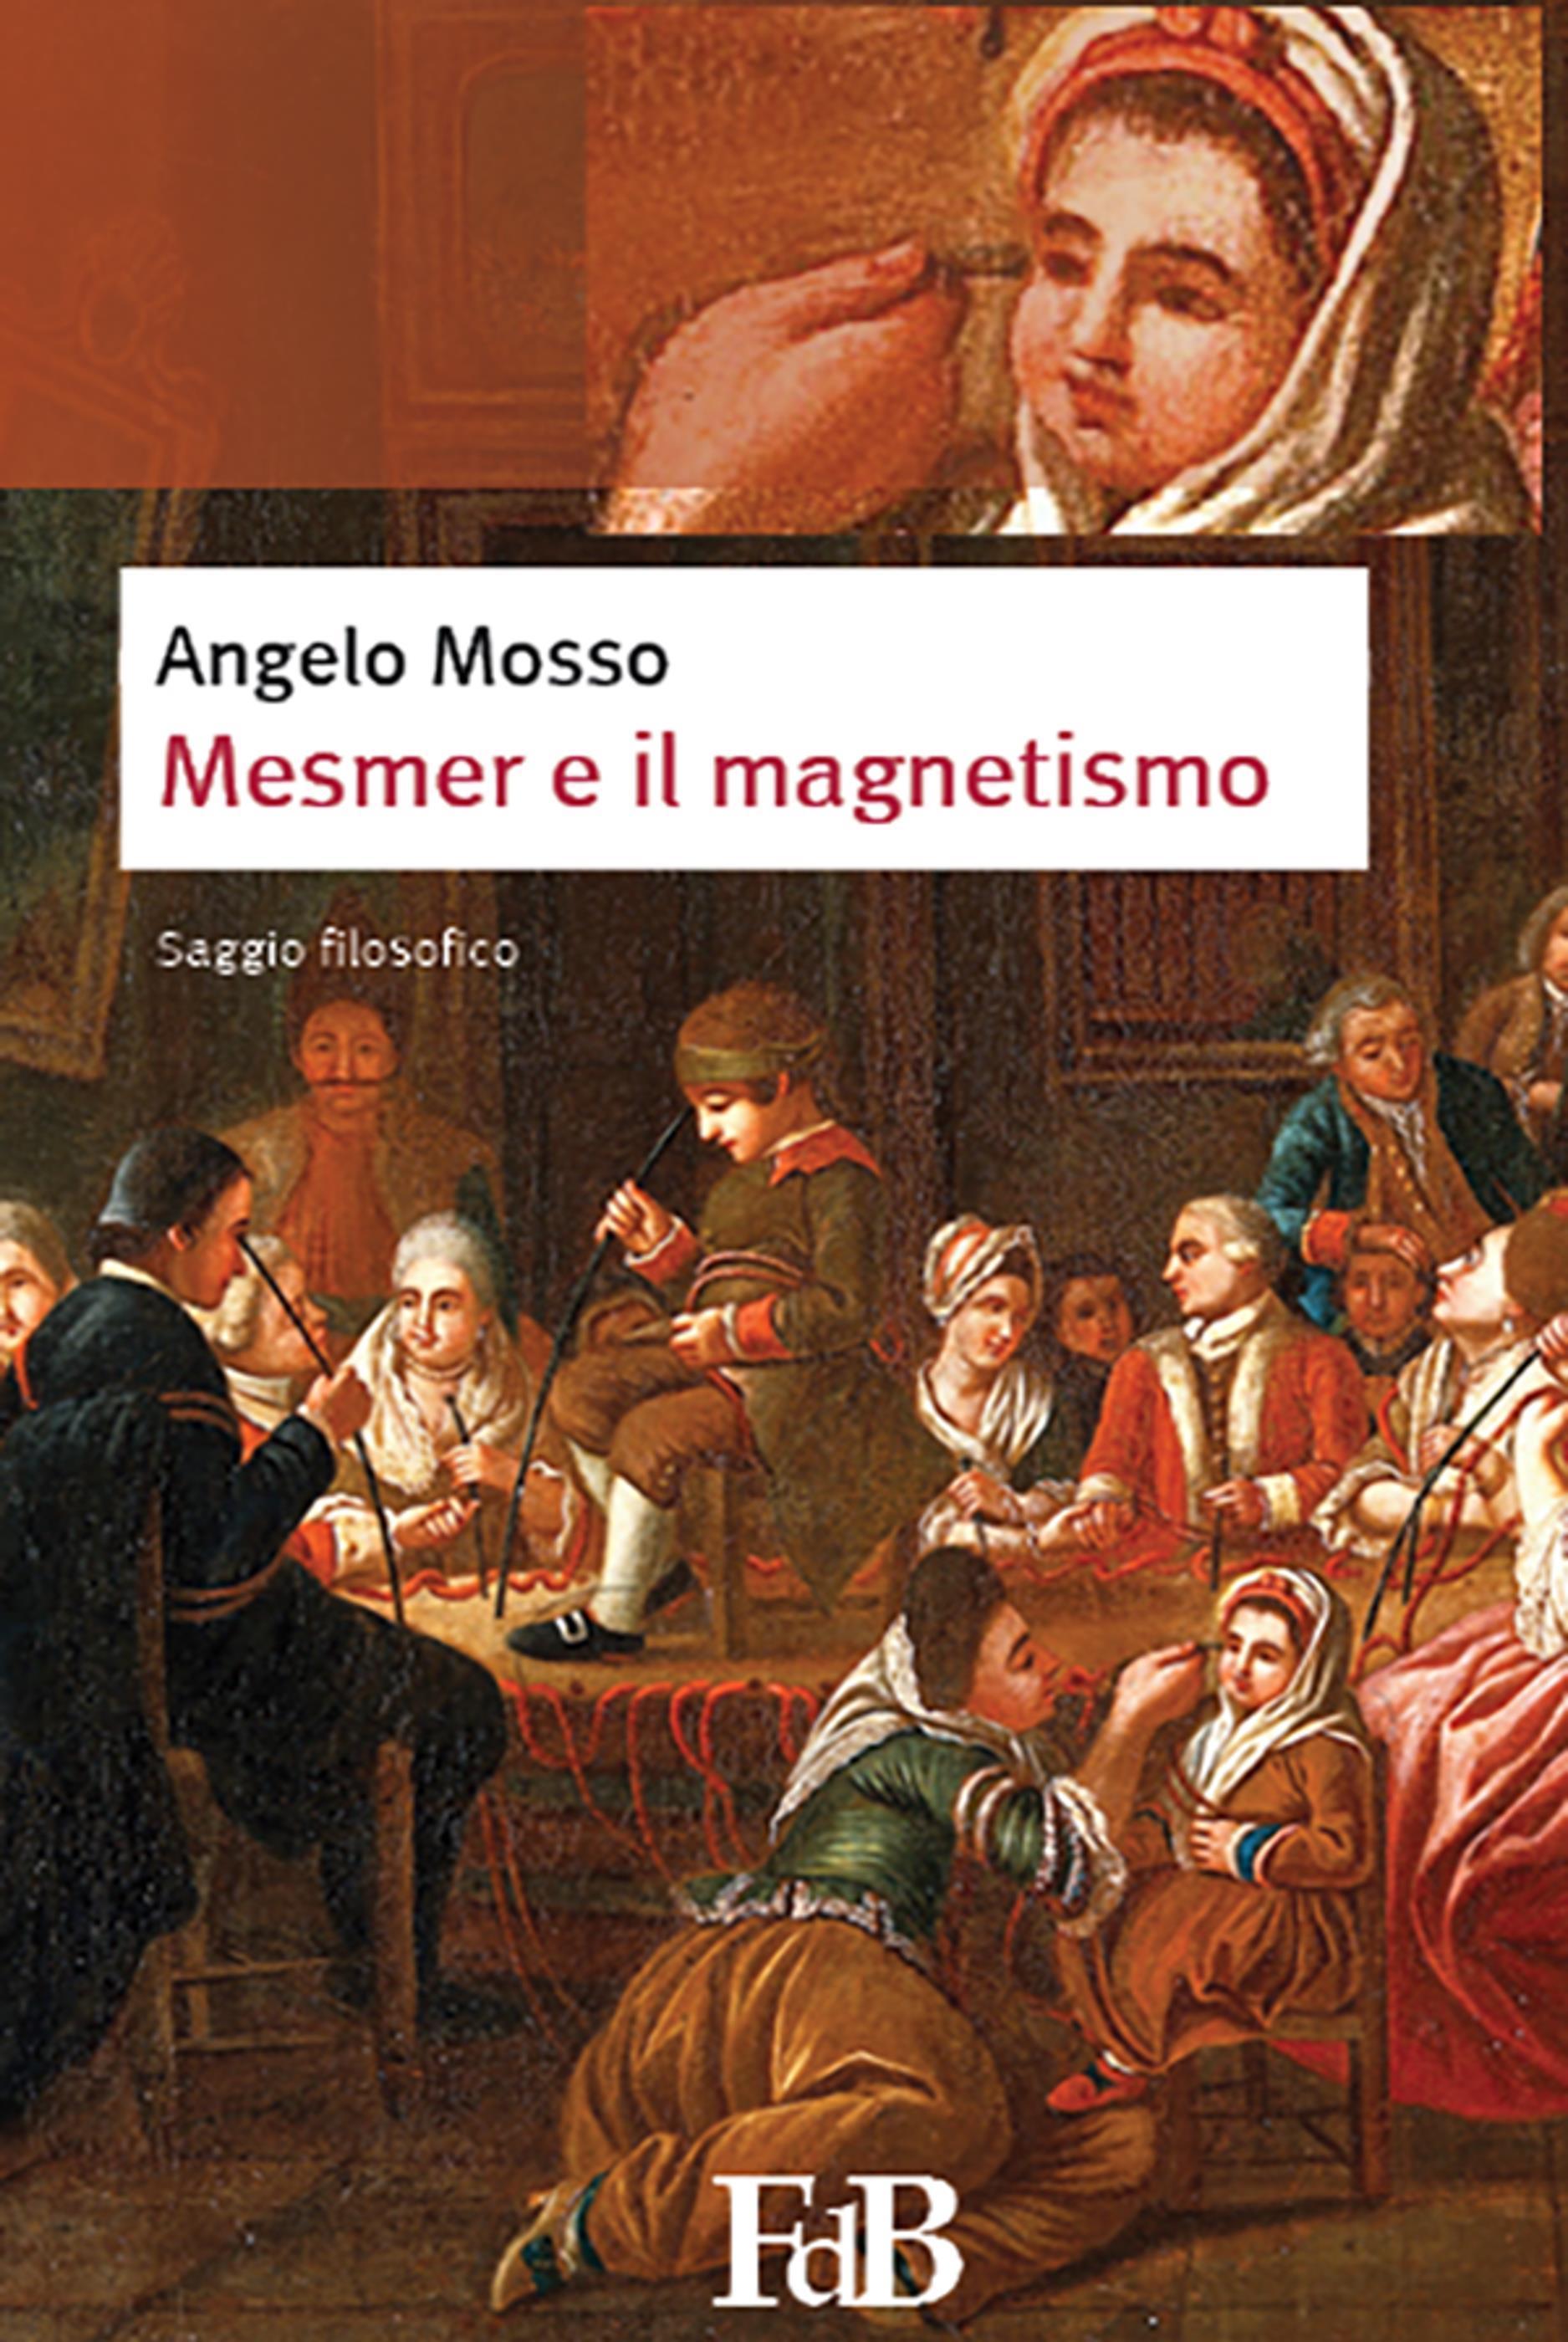 Mesmer e il magnetismo